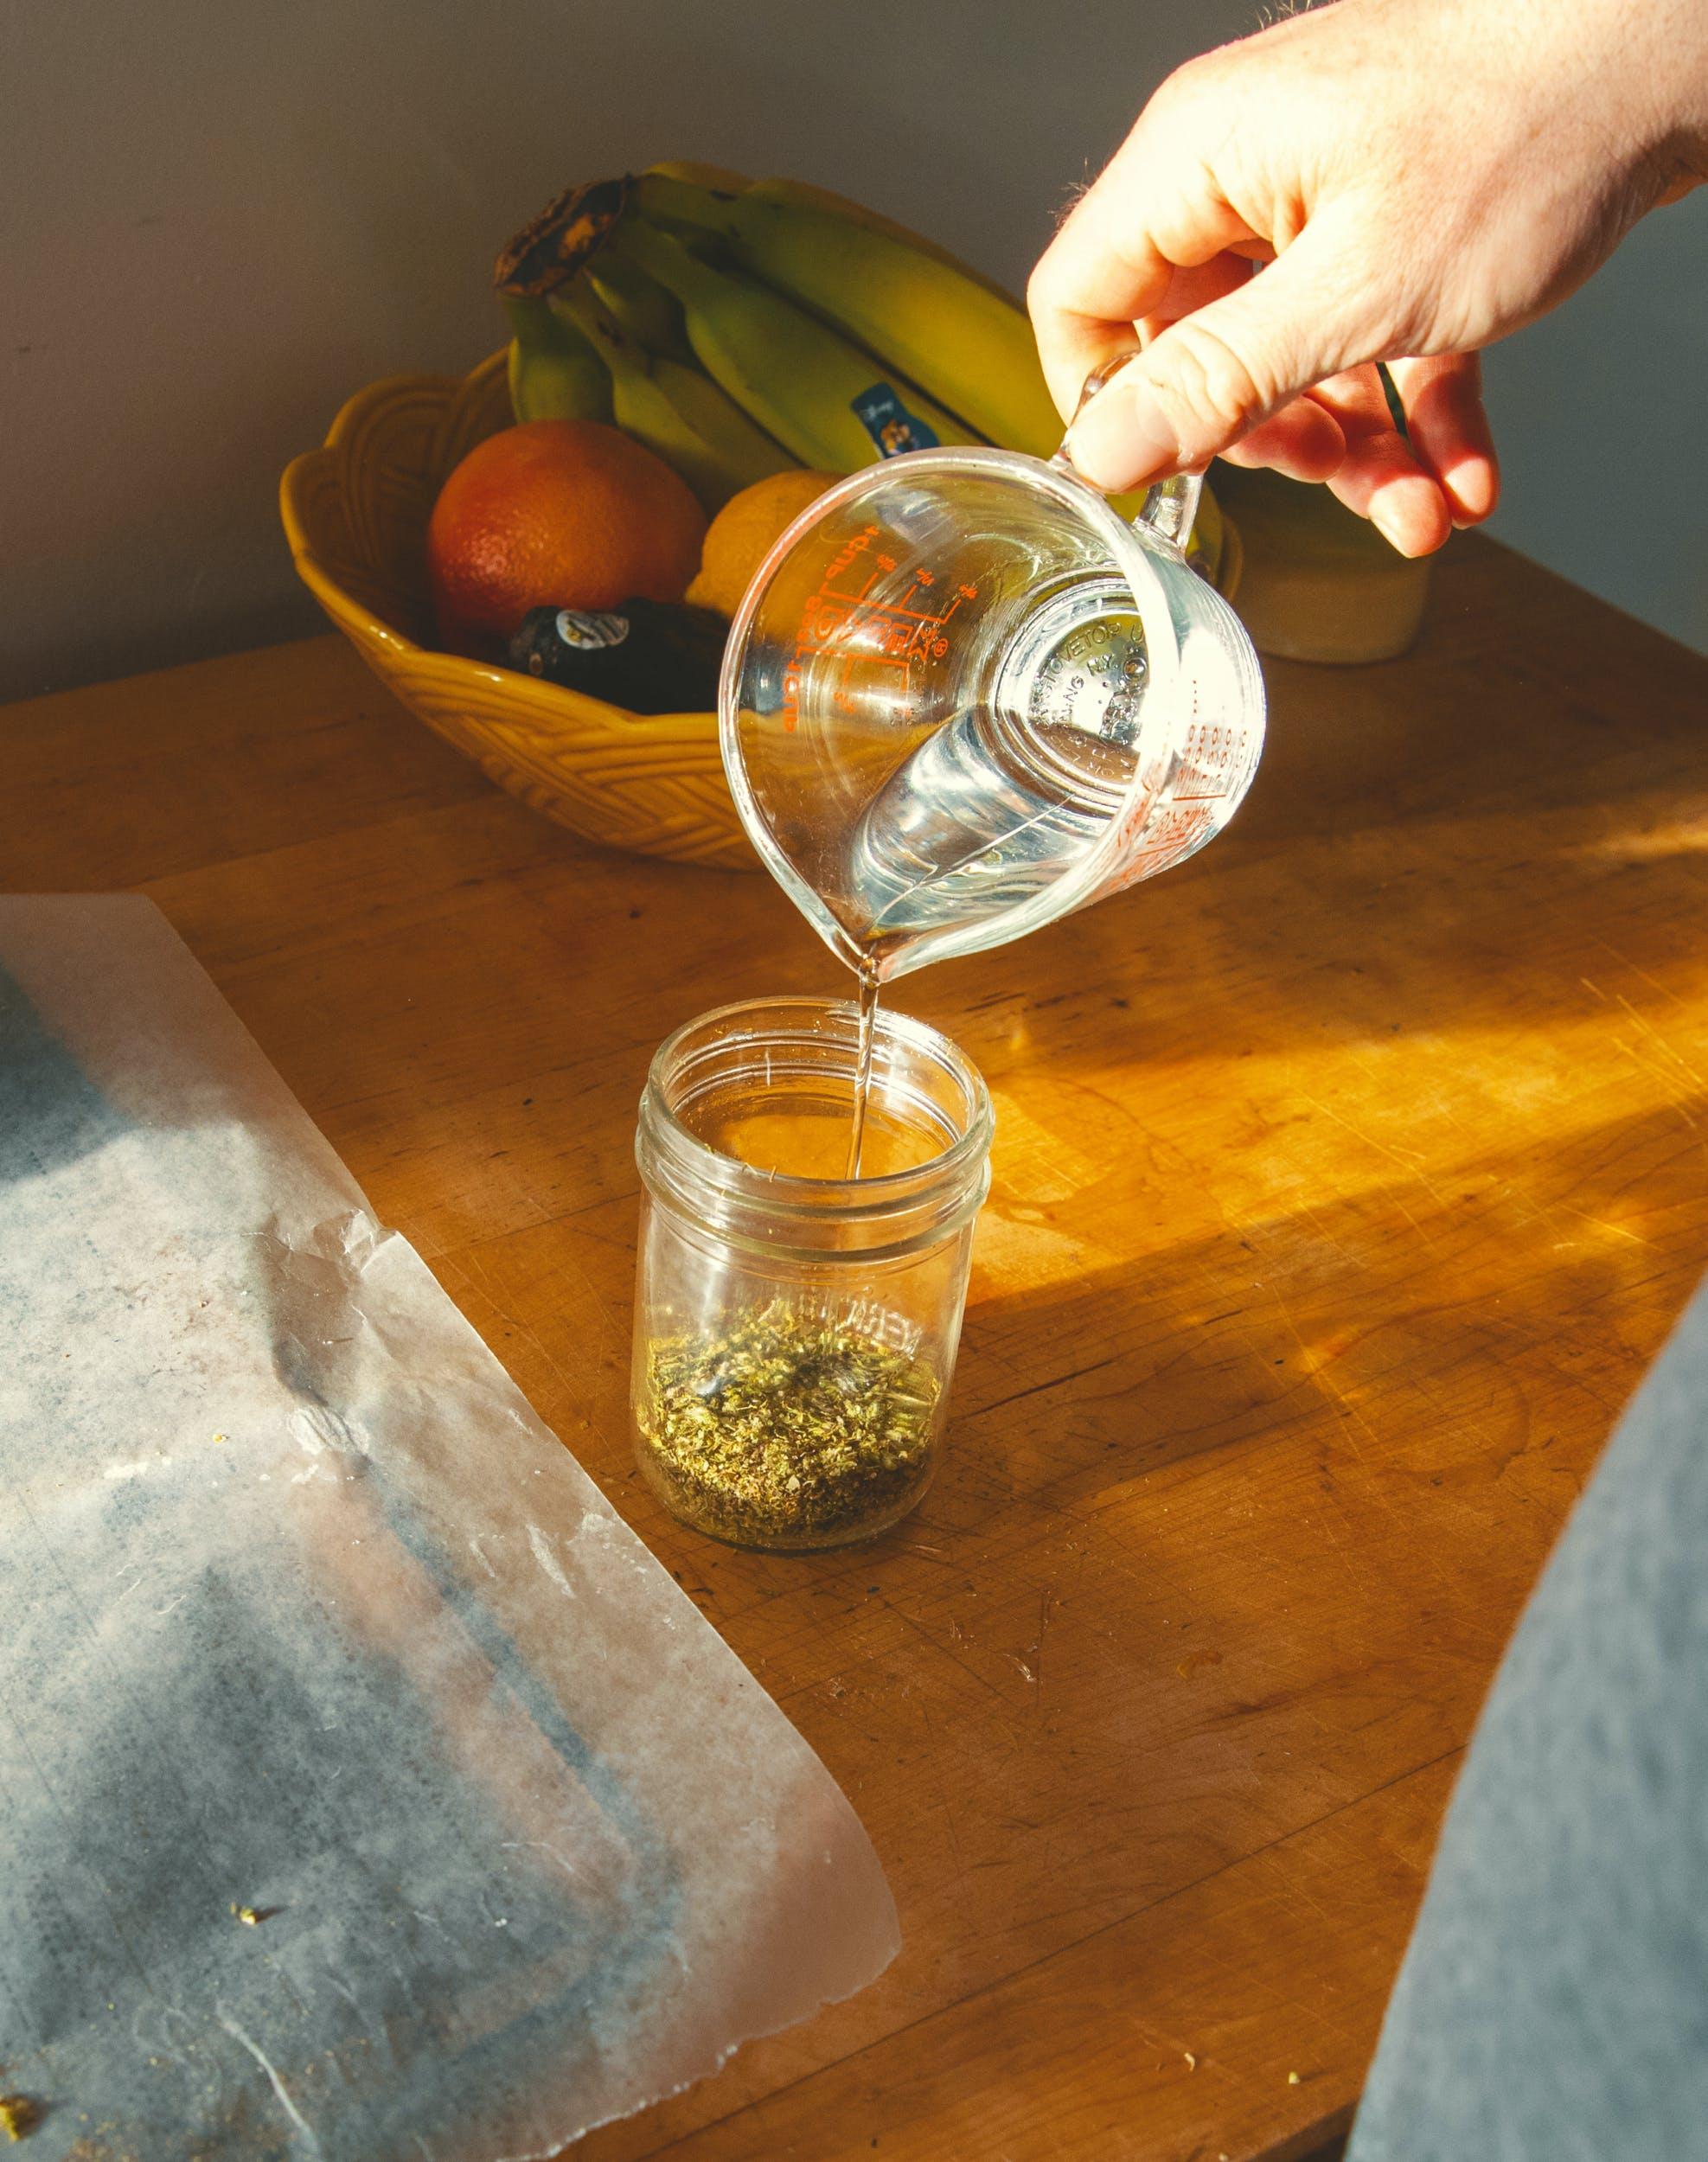 How to Make Cannabis Tincture 105 e1548365432738 Heres How to Make Cannabis Tincture in Your Own Kitchen